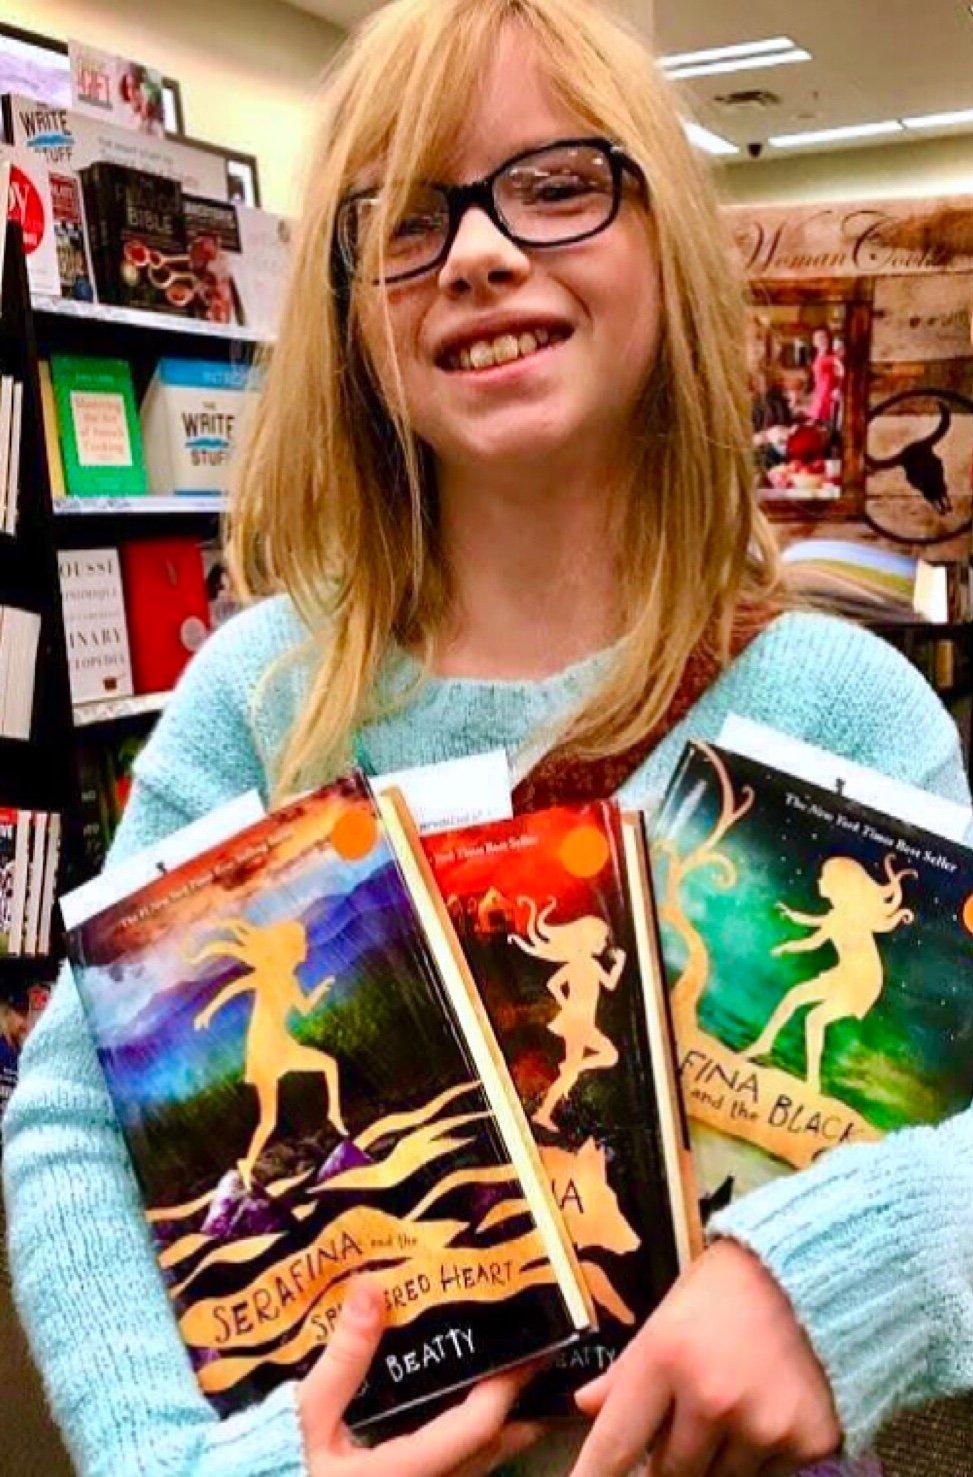 Box set of all three Serafina books